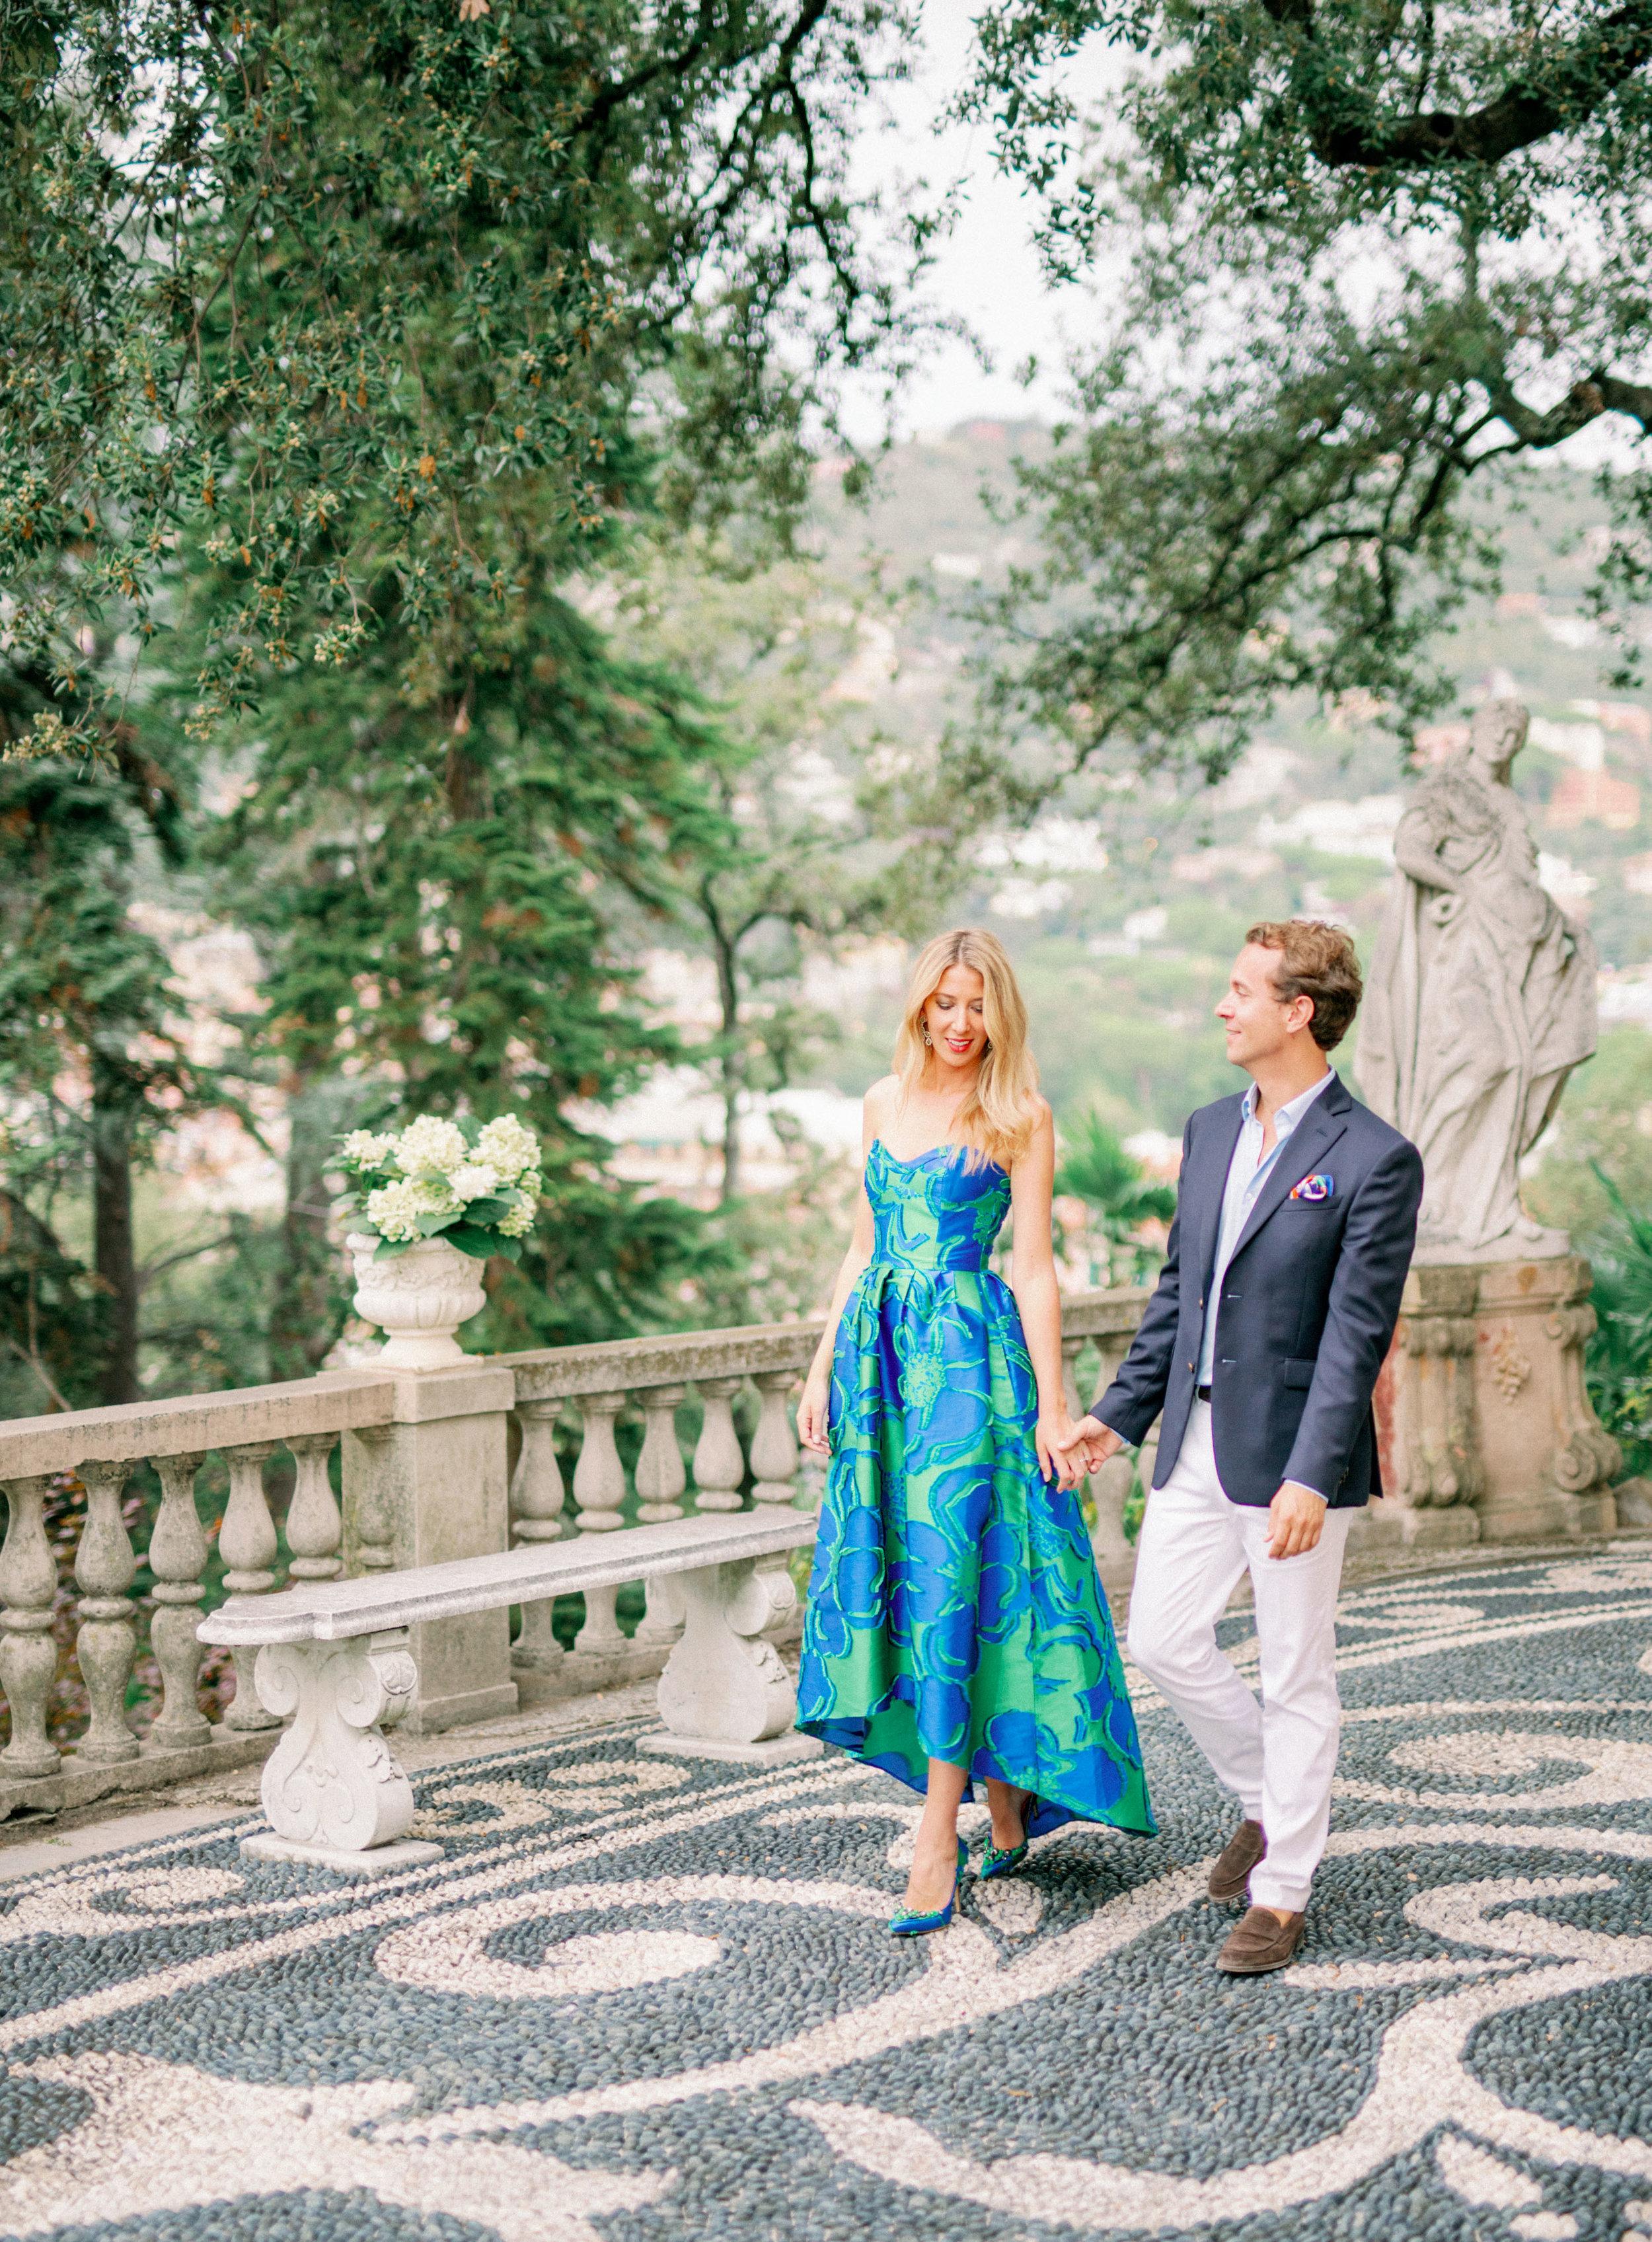 portofino-italy-destination-wedding-hunter-ryan-photo-9.jpg